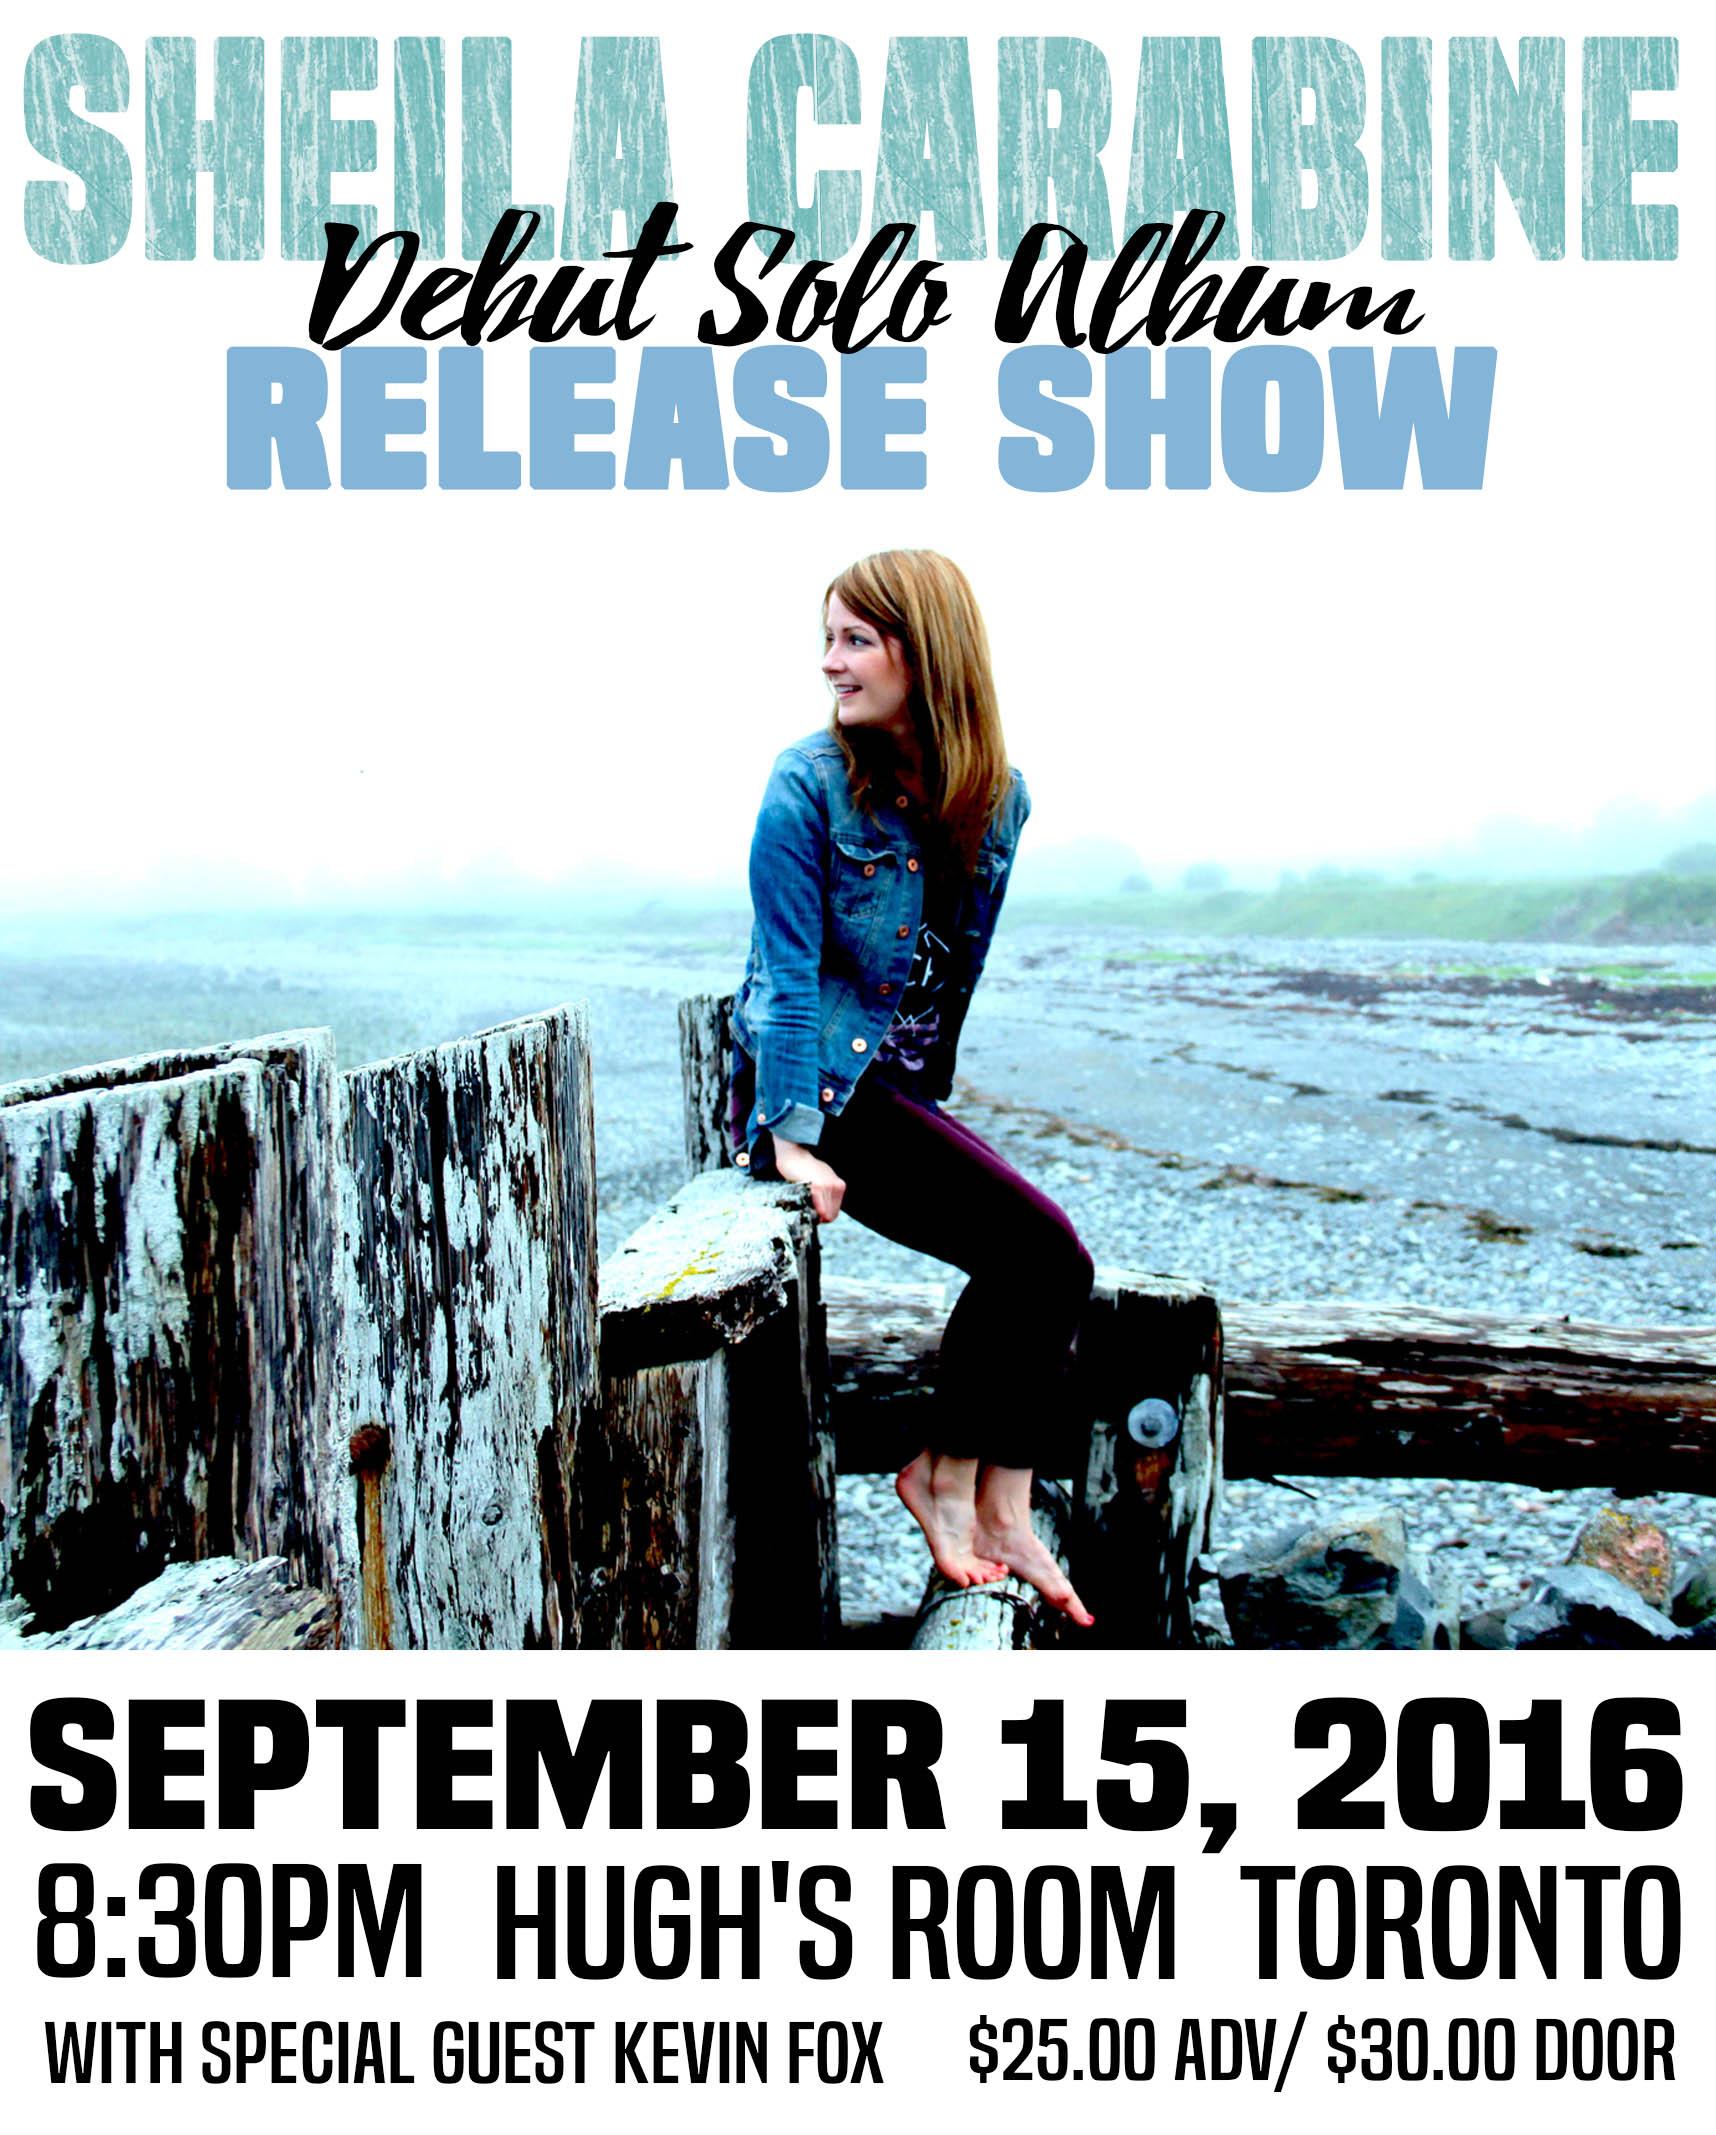 Solo release show